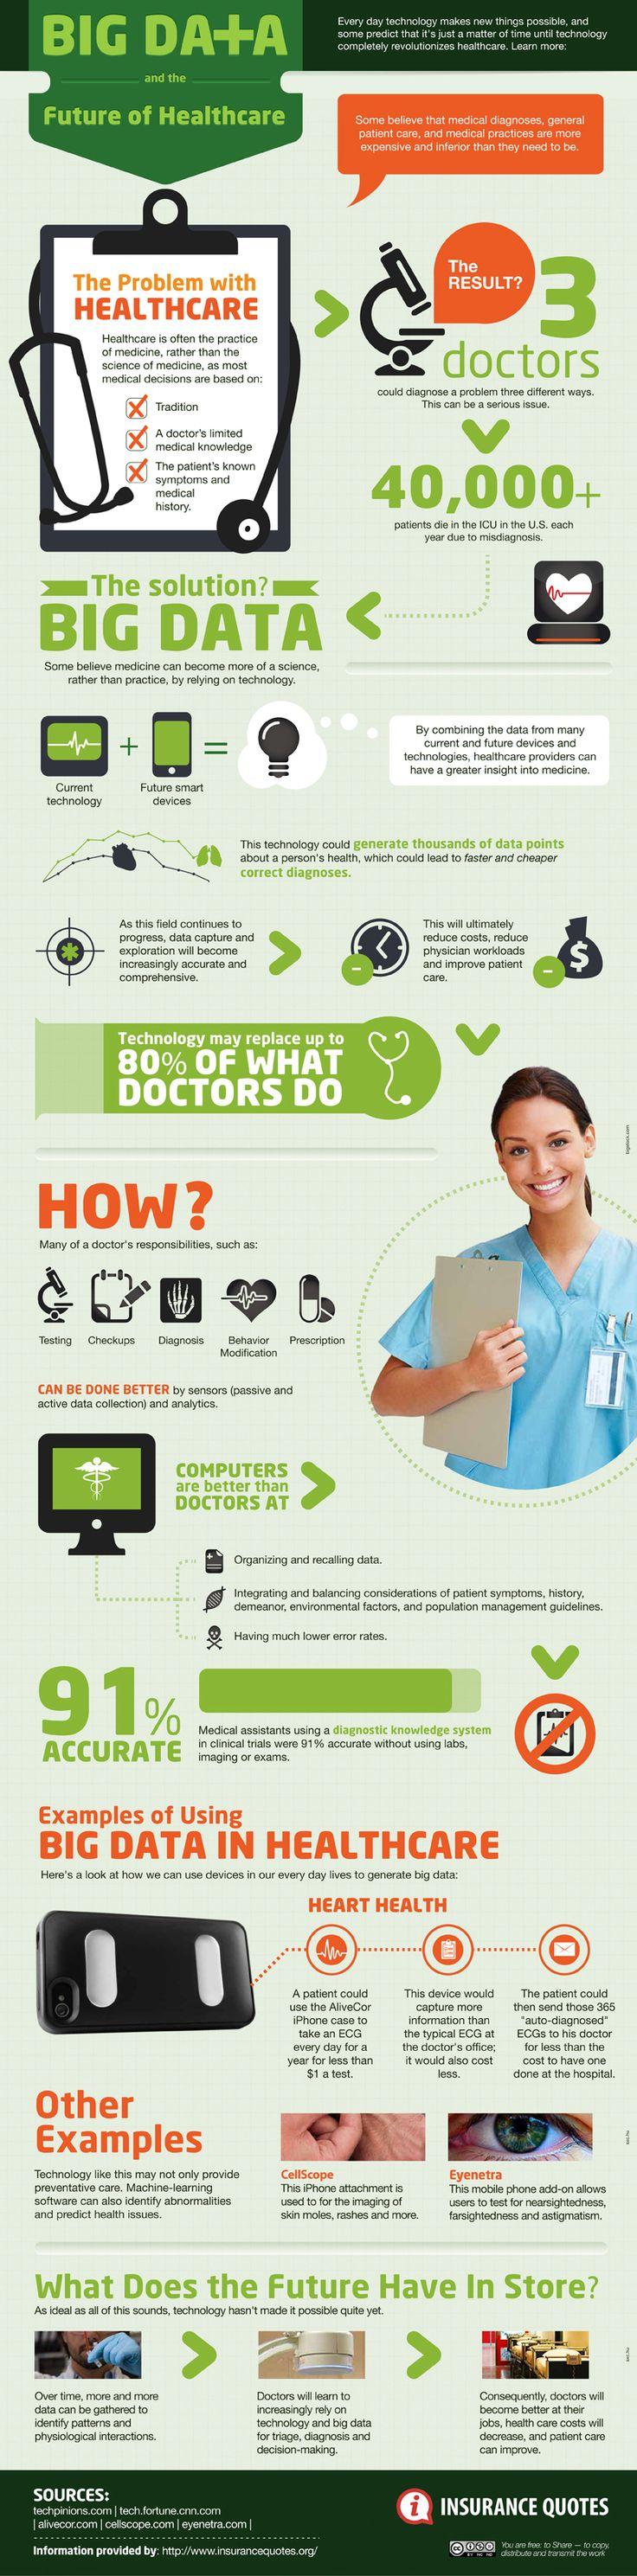 #Bigdata en medicina #salud